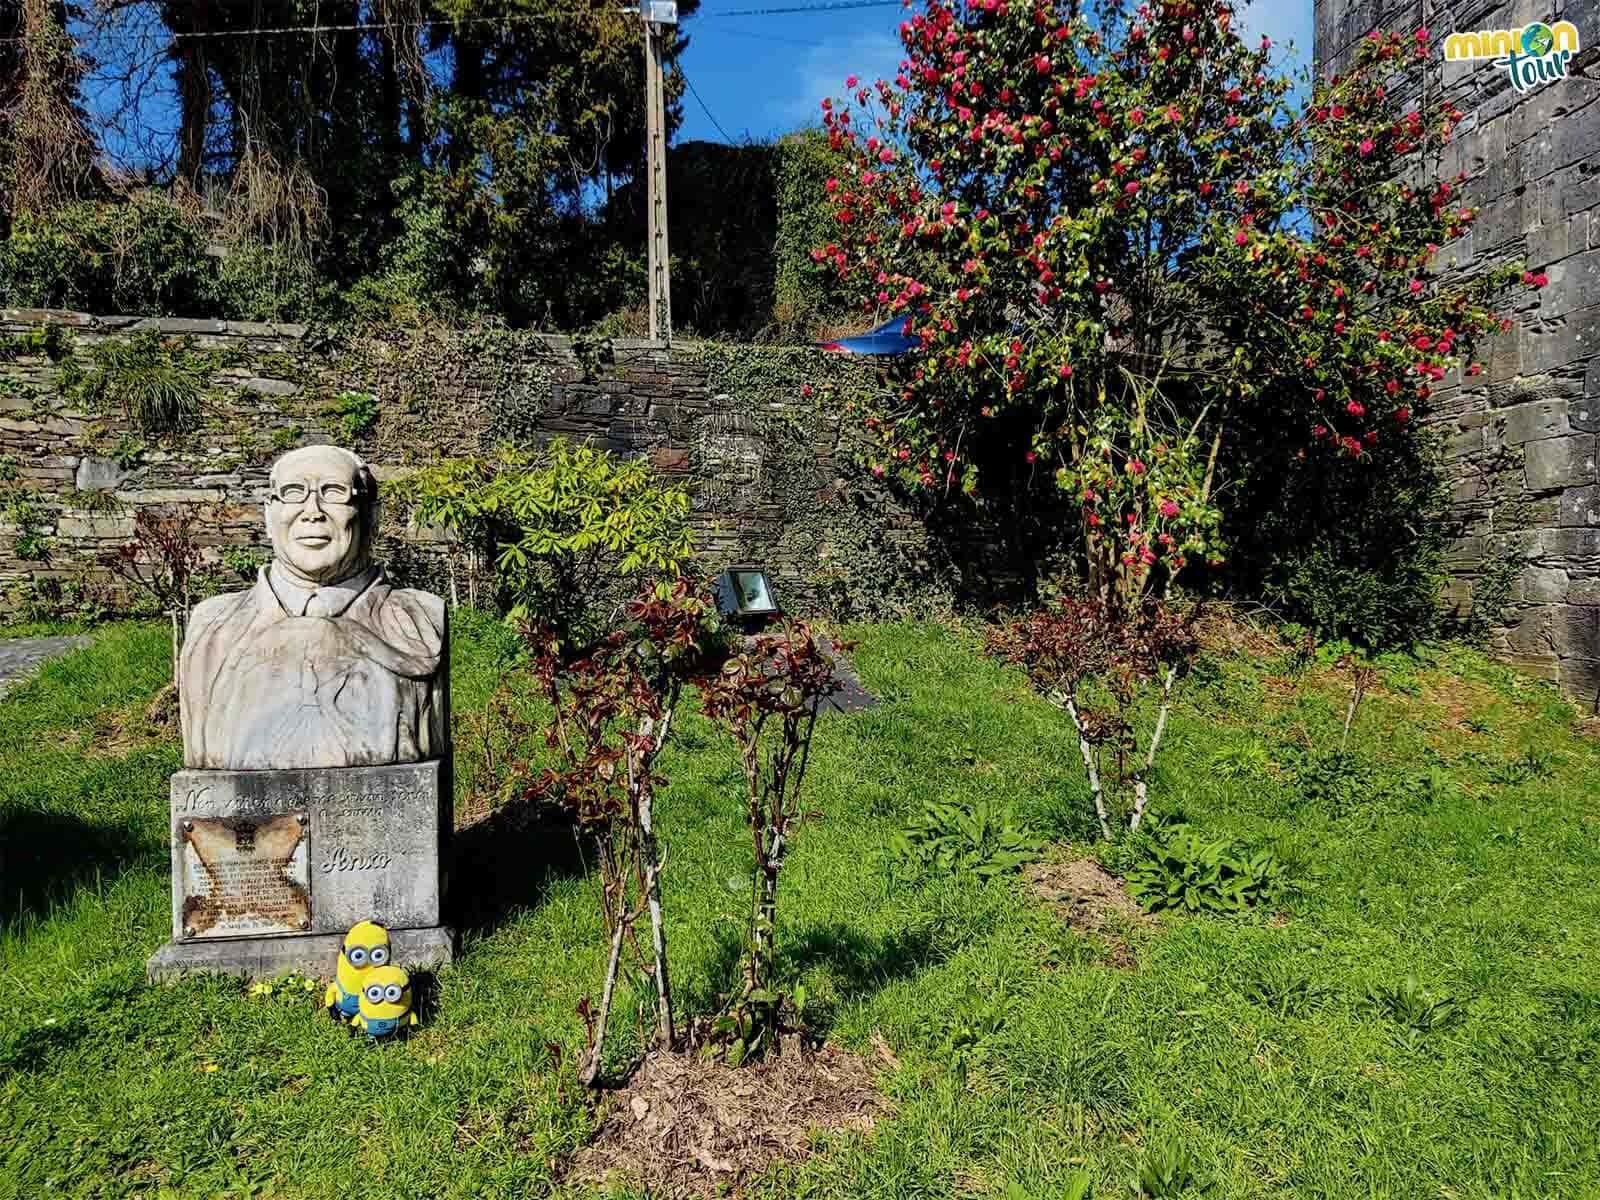 Estamos posando con la escultura de Anxo González